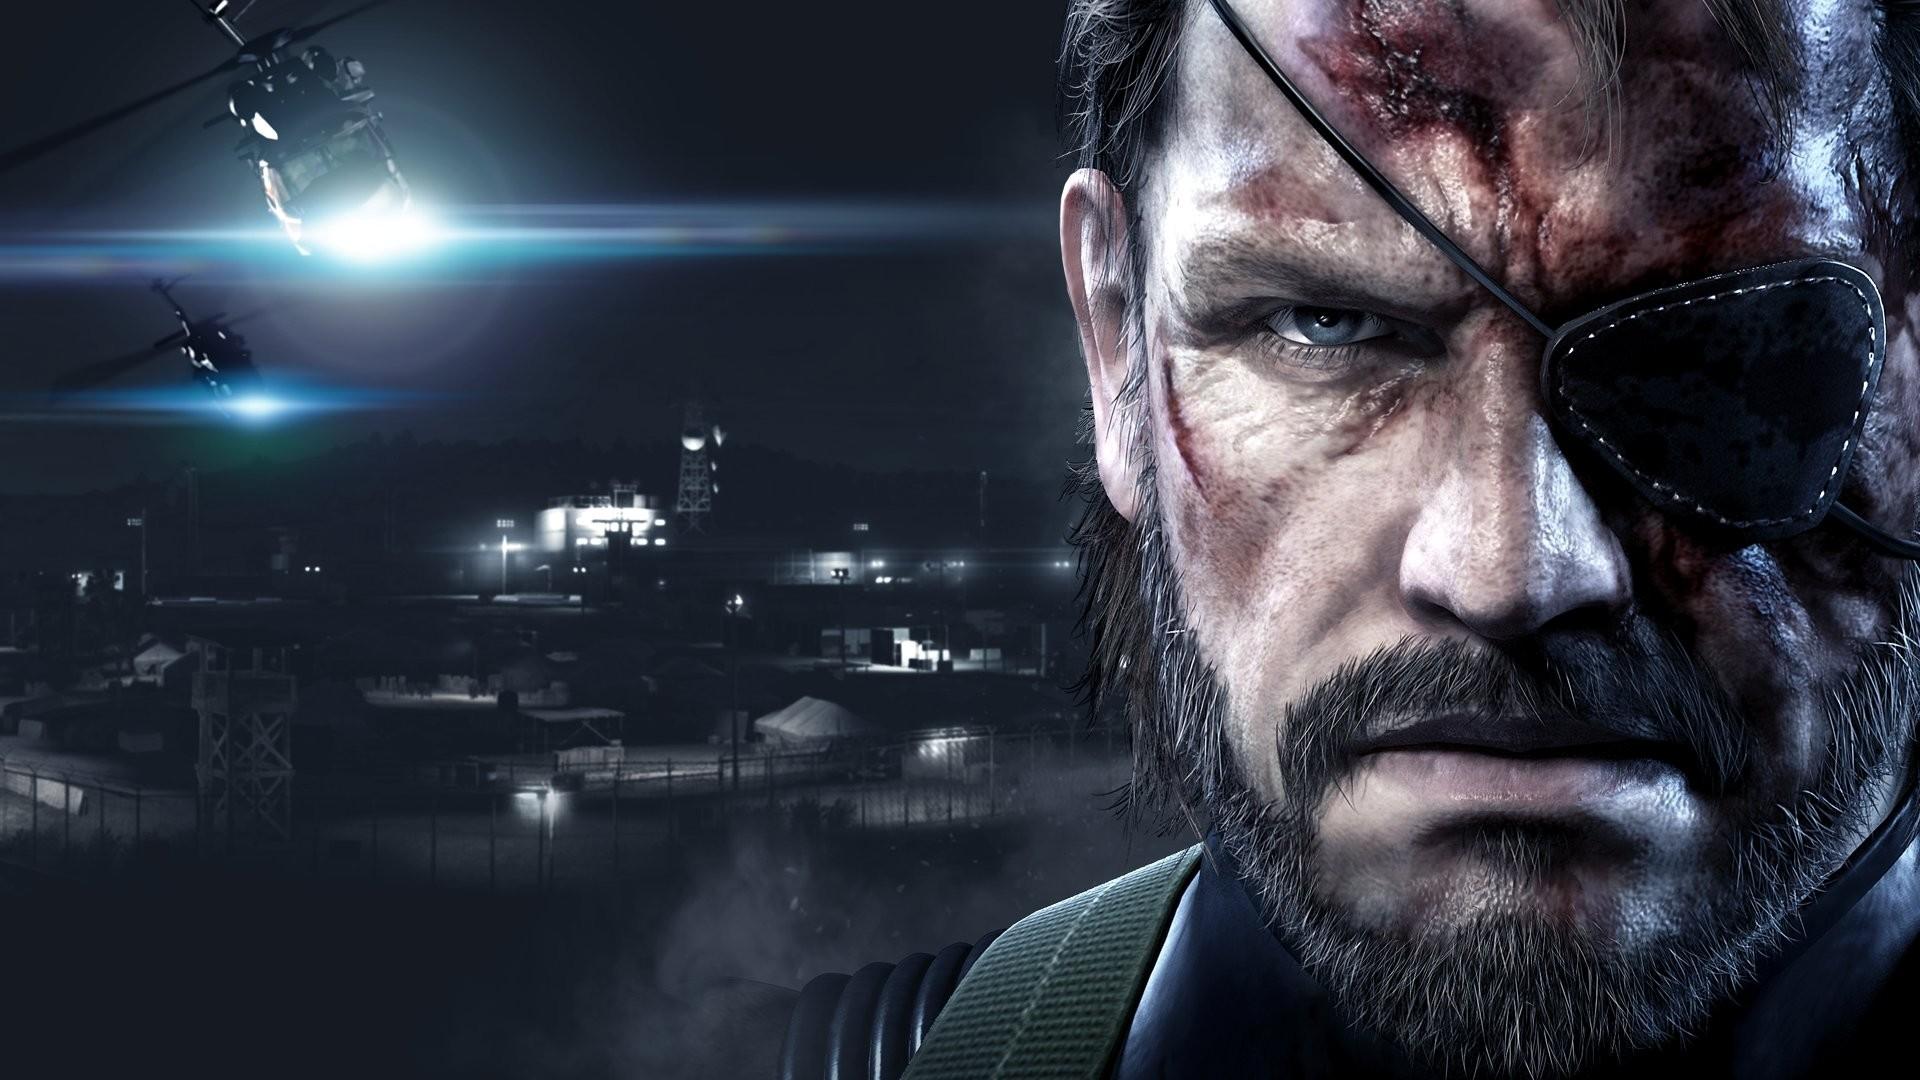 Wallpaper HD Metal Gear Solid V Ground Zeroes #MGSVGroundZeroes #MGS # MetalGearSolid #GroundZeroes